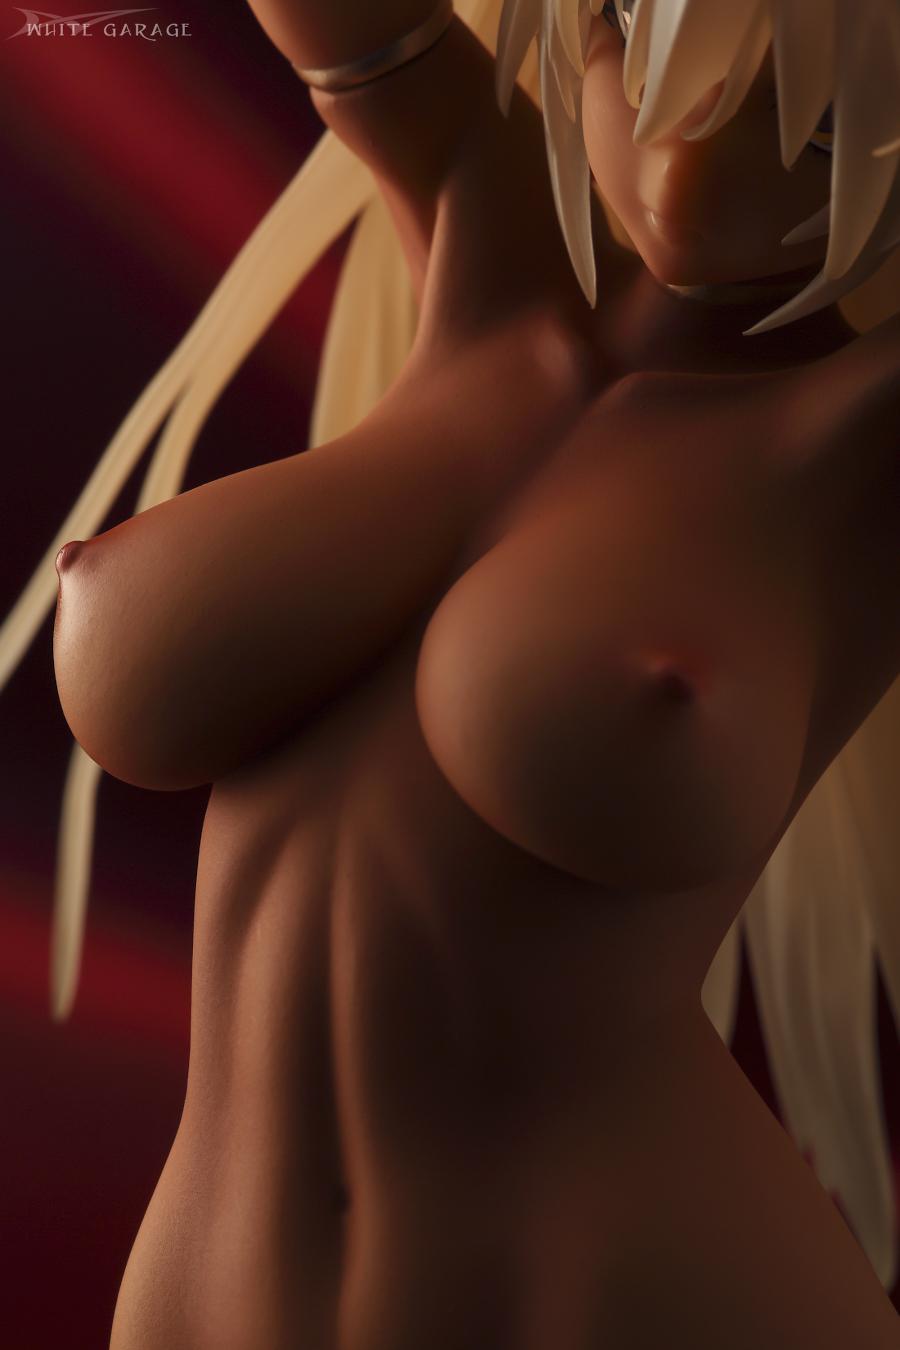 muramasa113